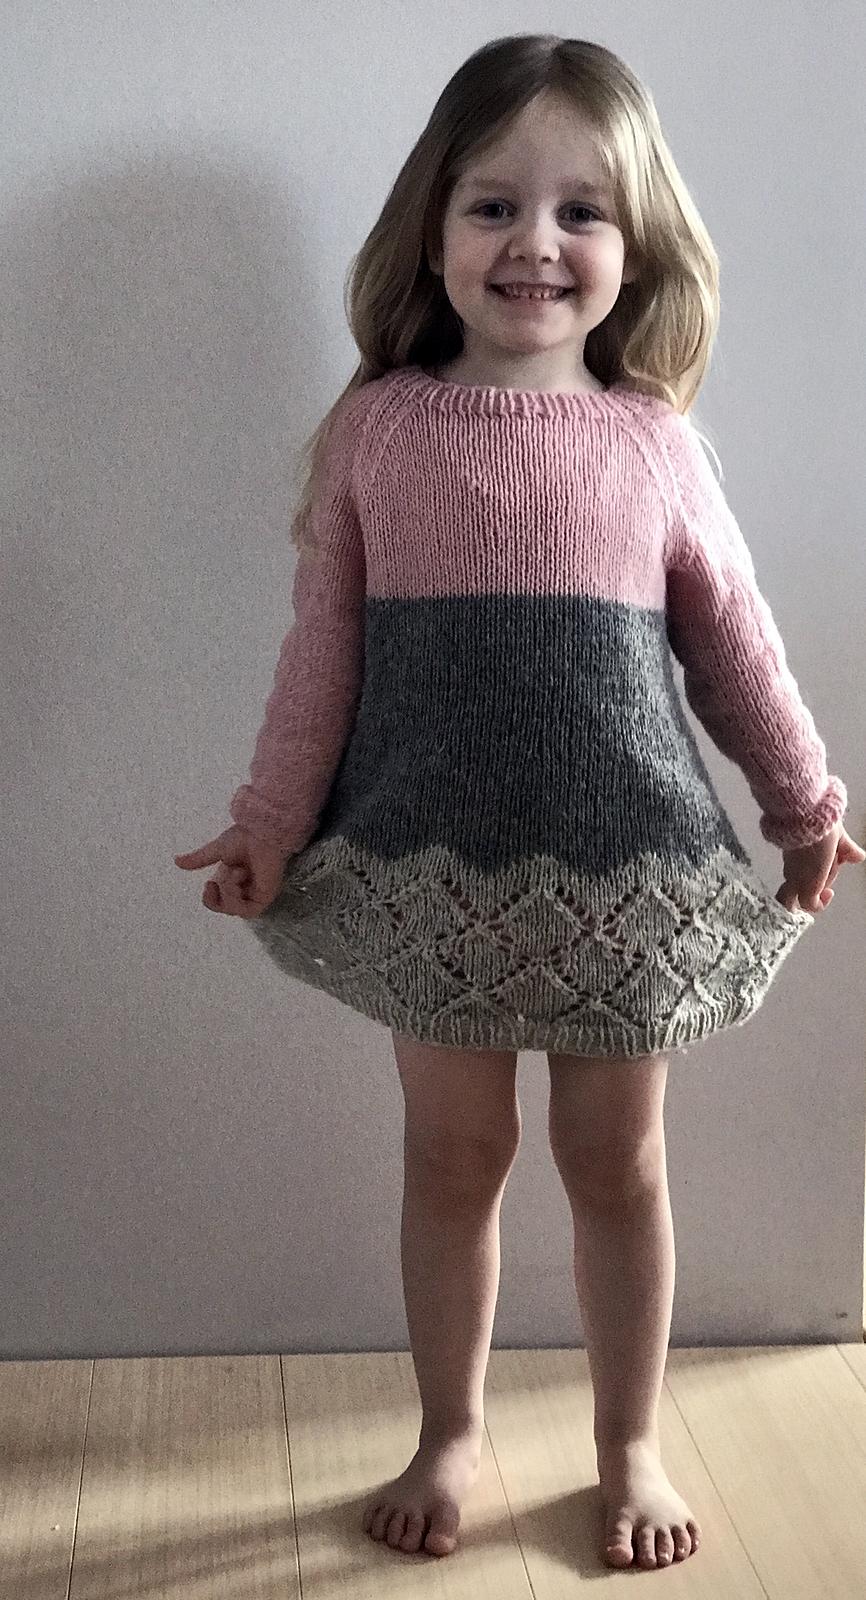 Ravelry Hipster Sweater Dress By Randi Hjelm Debes Sweater Dress Pattern Knitted Sweaters Knitting Sweaters Diy [ 1600 x 866 Pixel ]